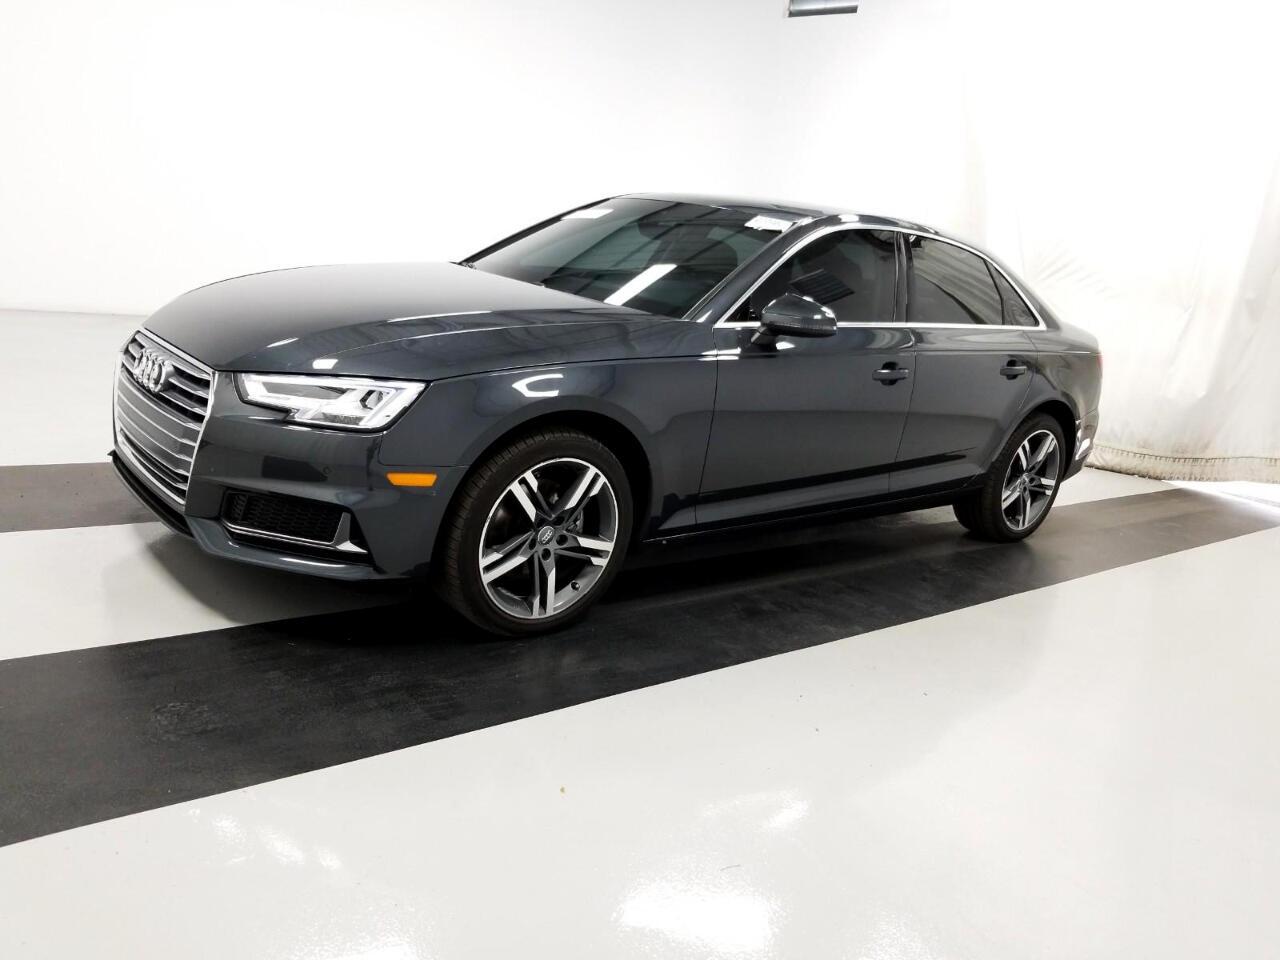 Audi A4 Premium Plus 40 TFSI 2019